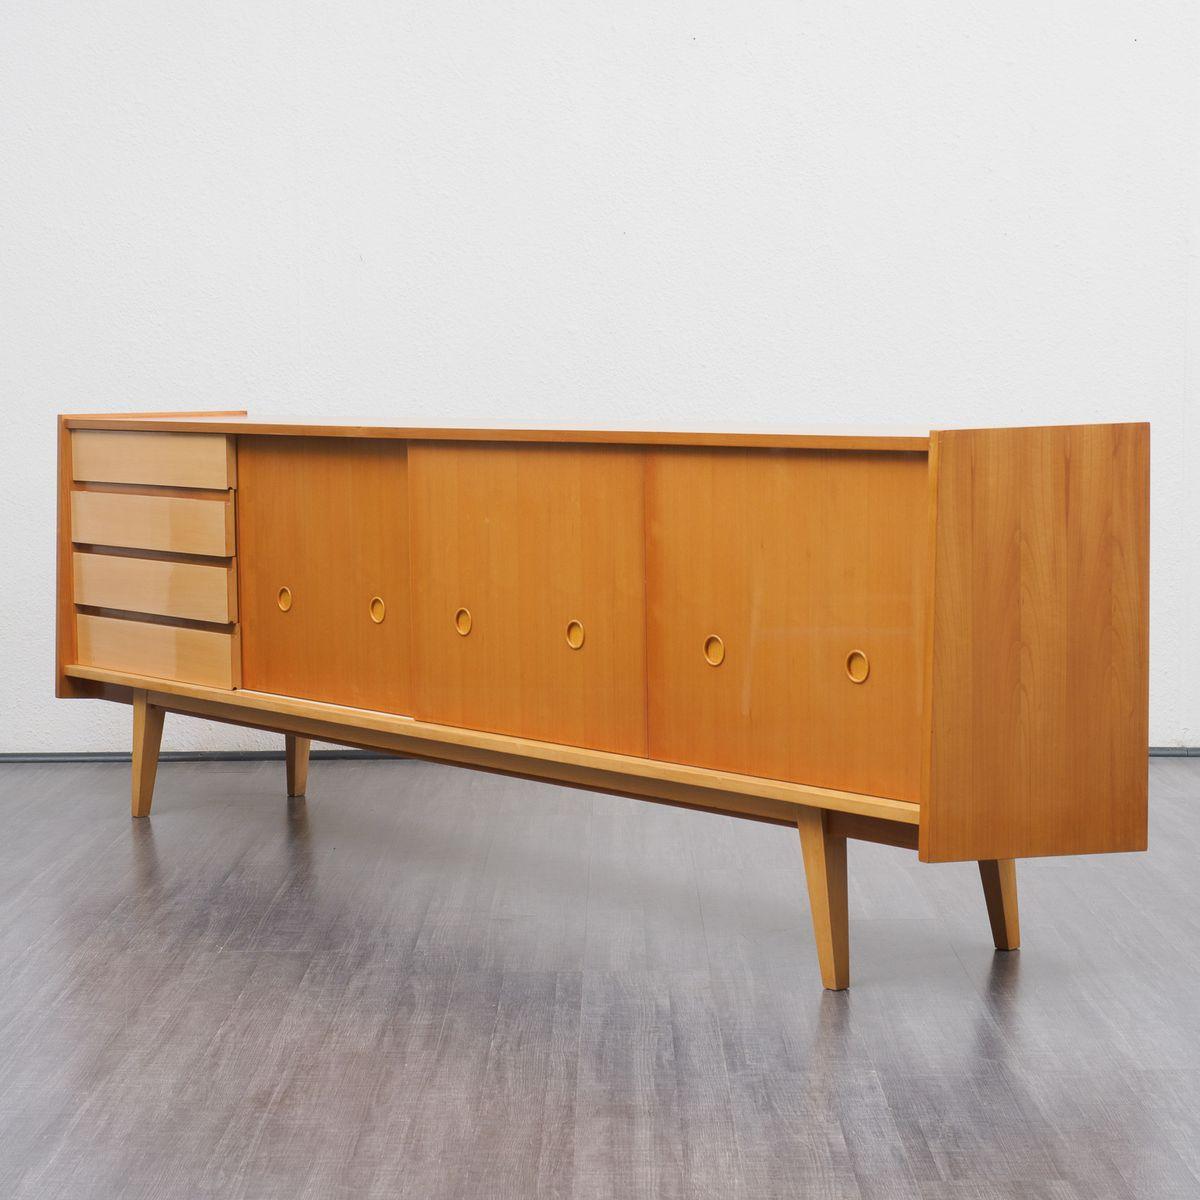 gro es sideboard aus kirschholz 1950er bei pamono kaufen. Black Bedroom Furniture Sets. Home Design Ideas